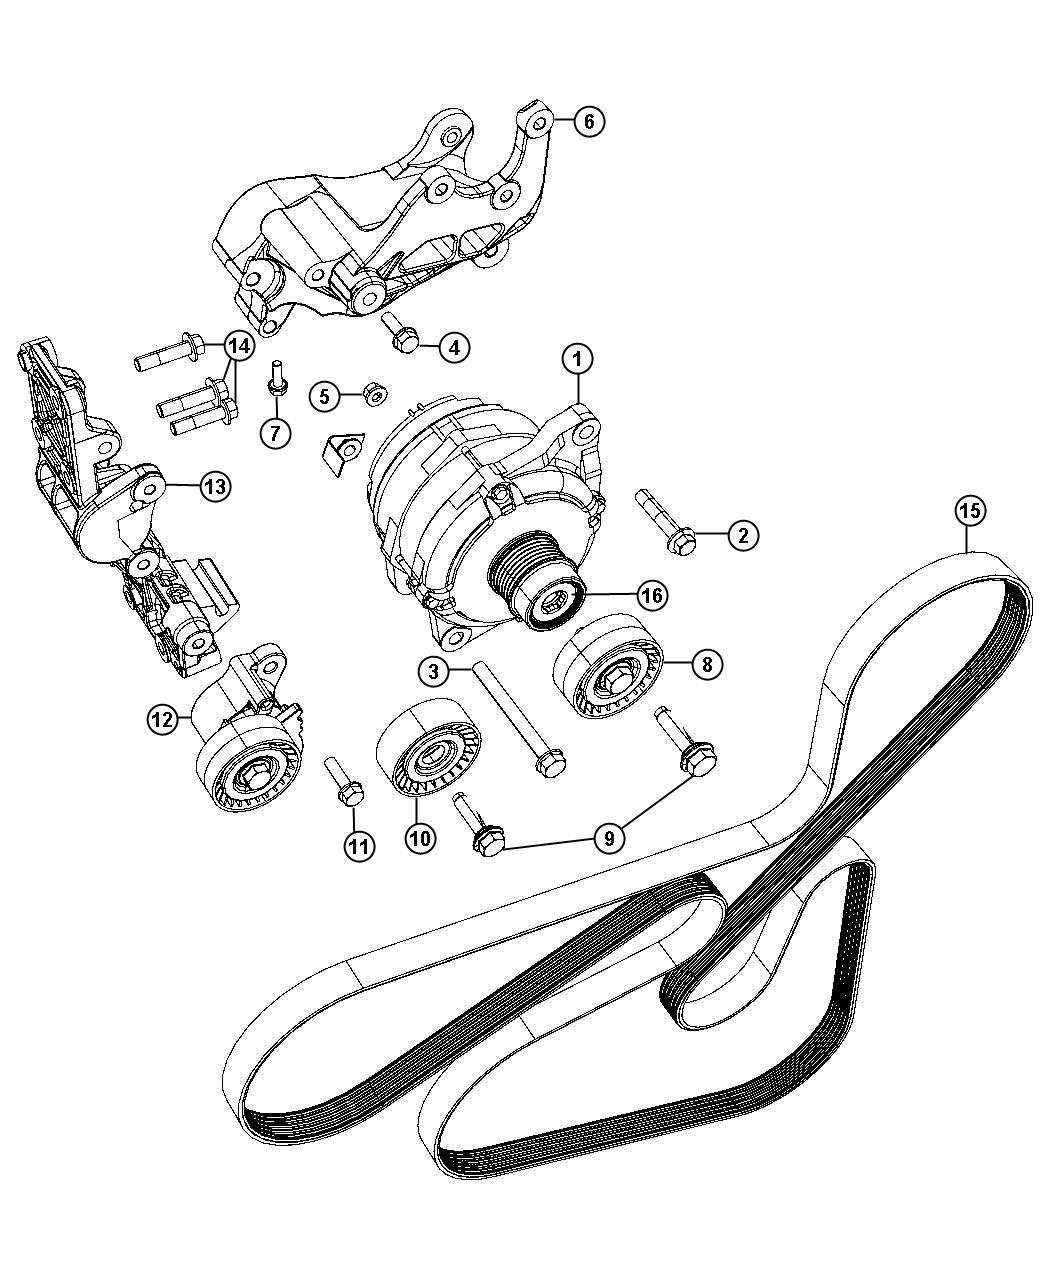 2008 Dodge Avenger Generator/Alternator and Related Parts.